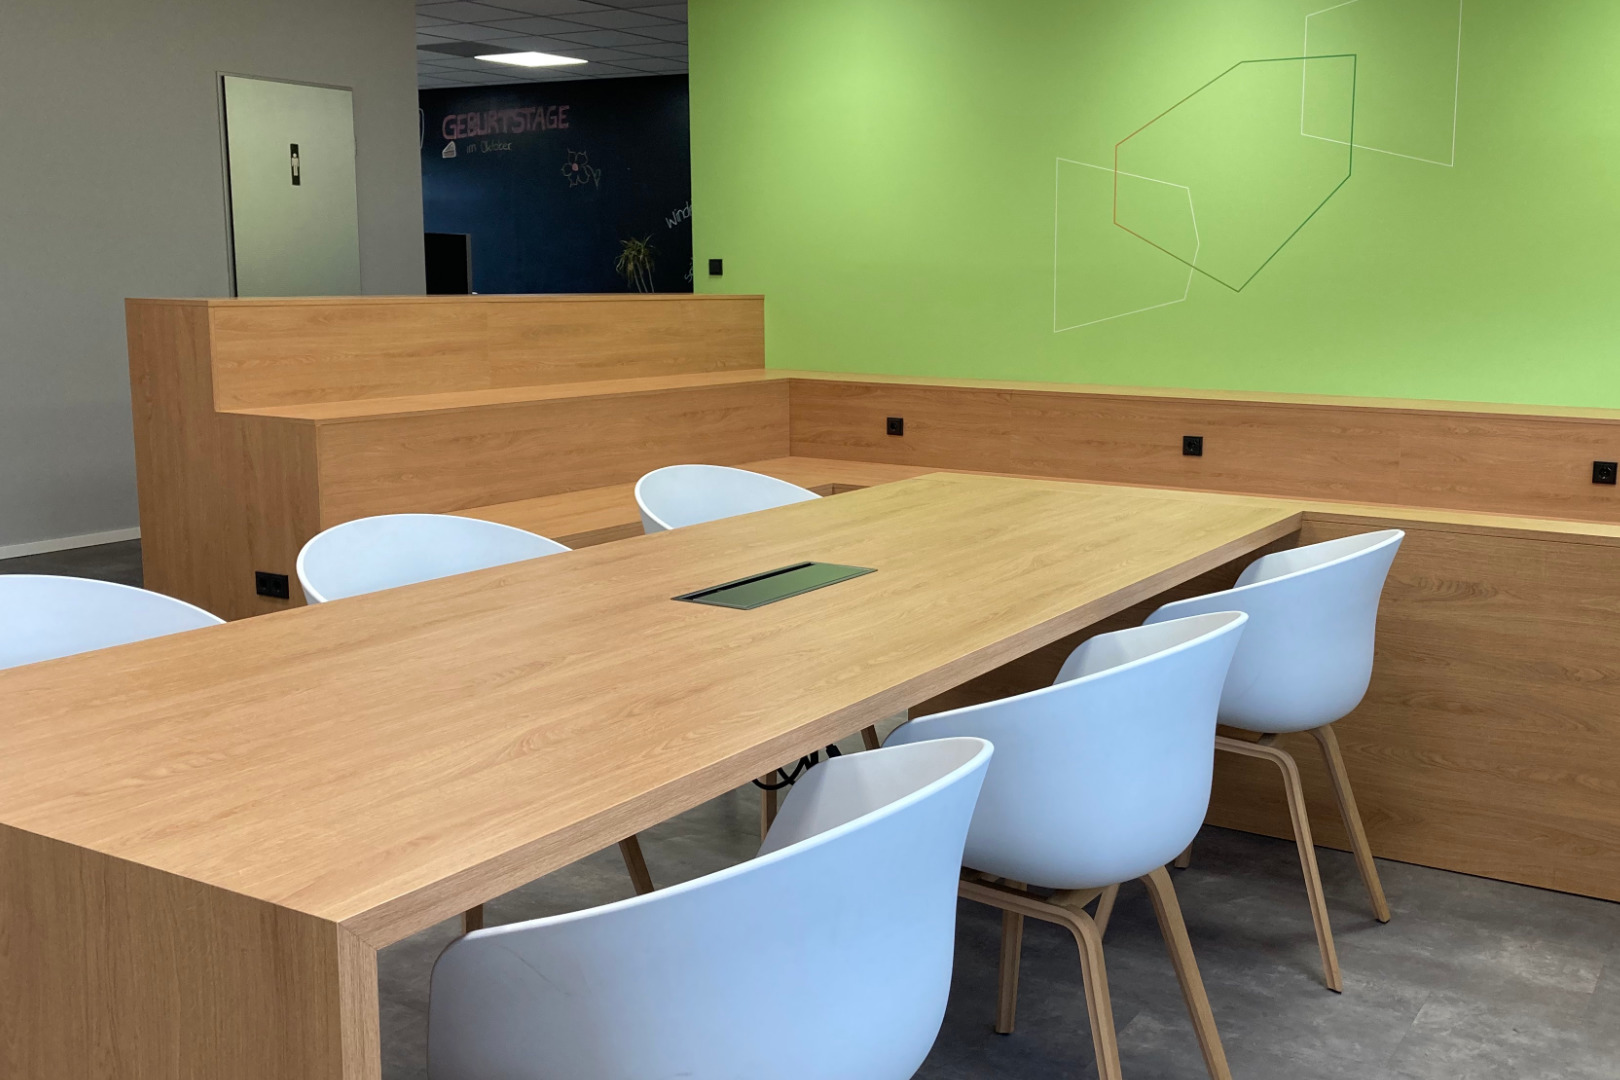 Innenarchitektur, Büroplanung, Ausführungsplanung, Terminplanung, Bauüberwachung